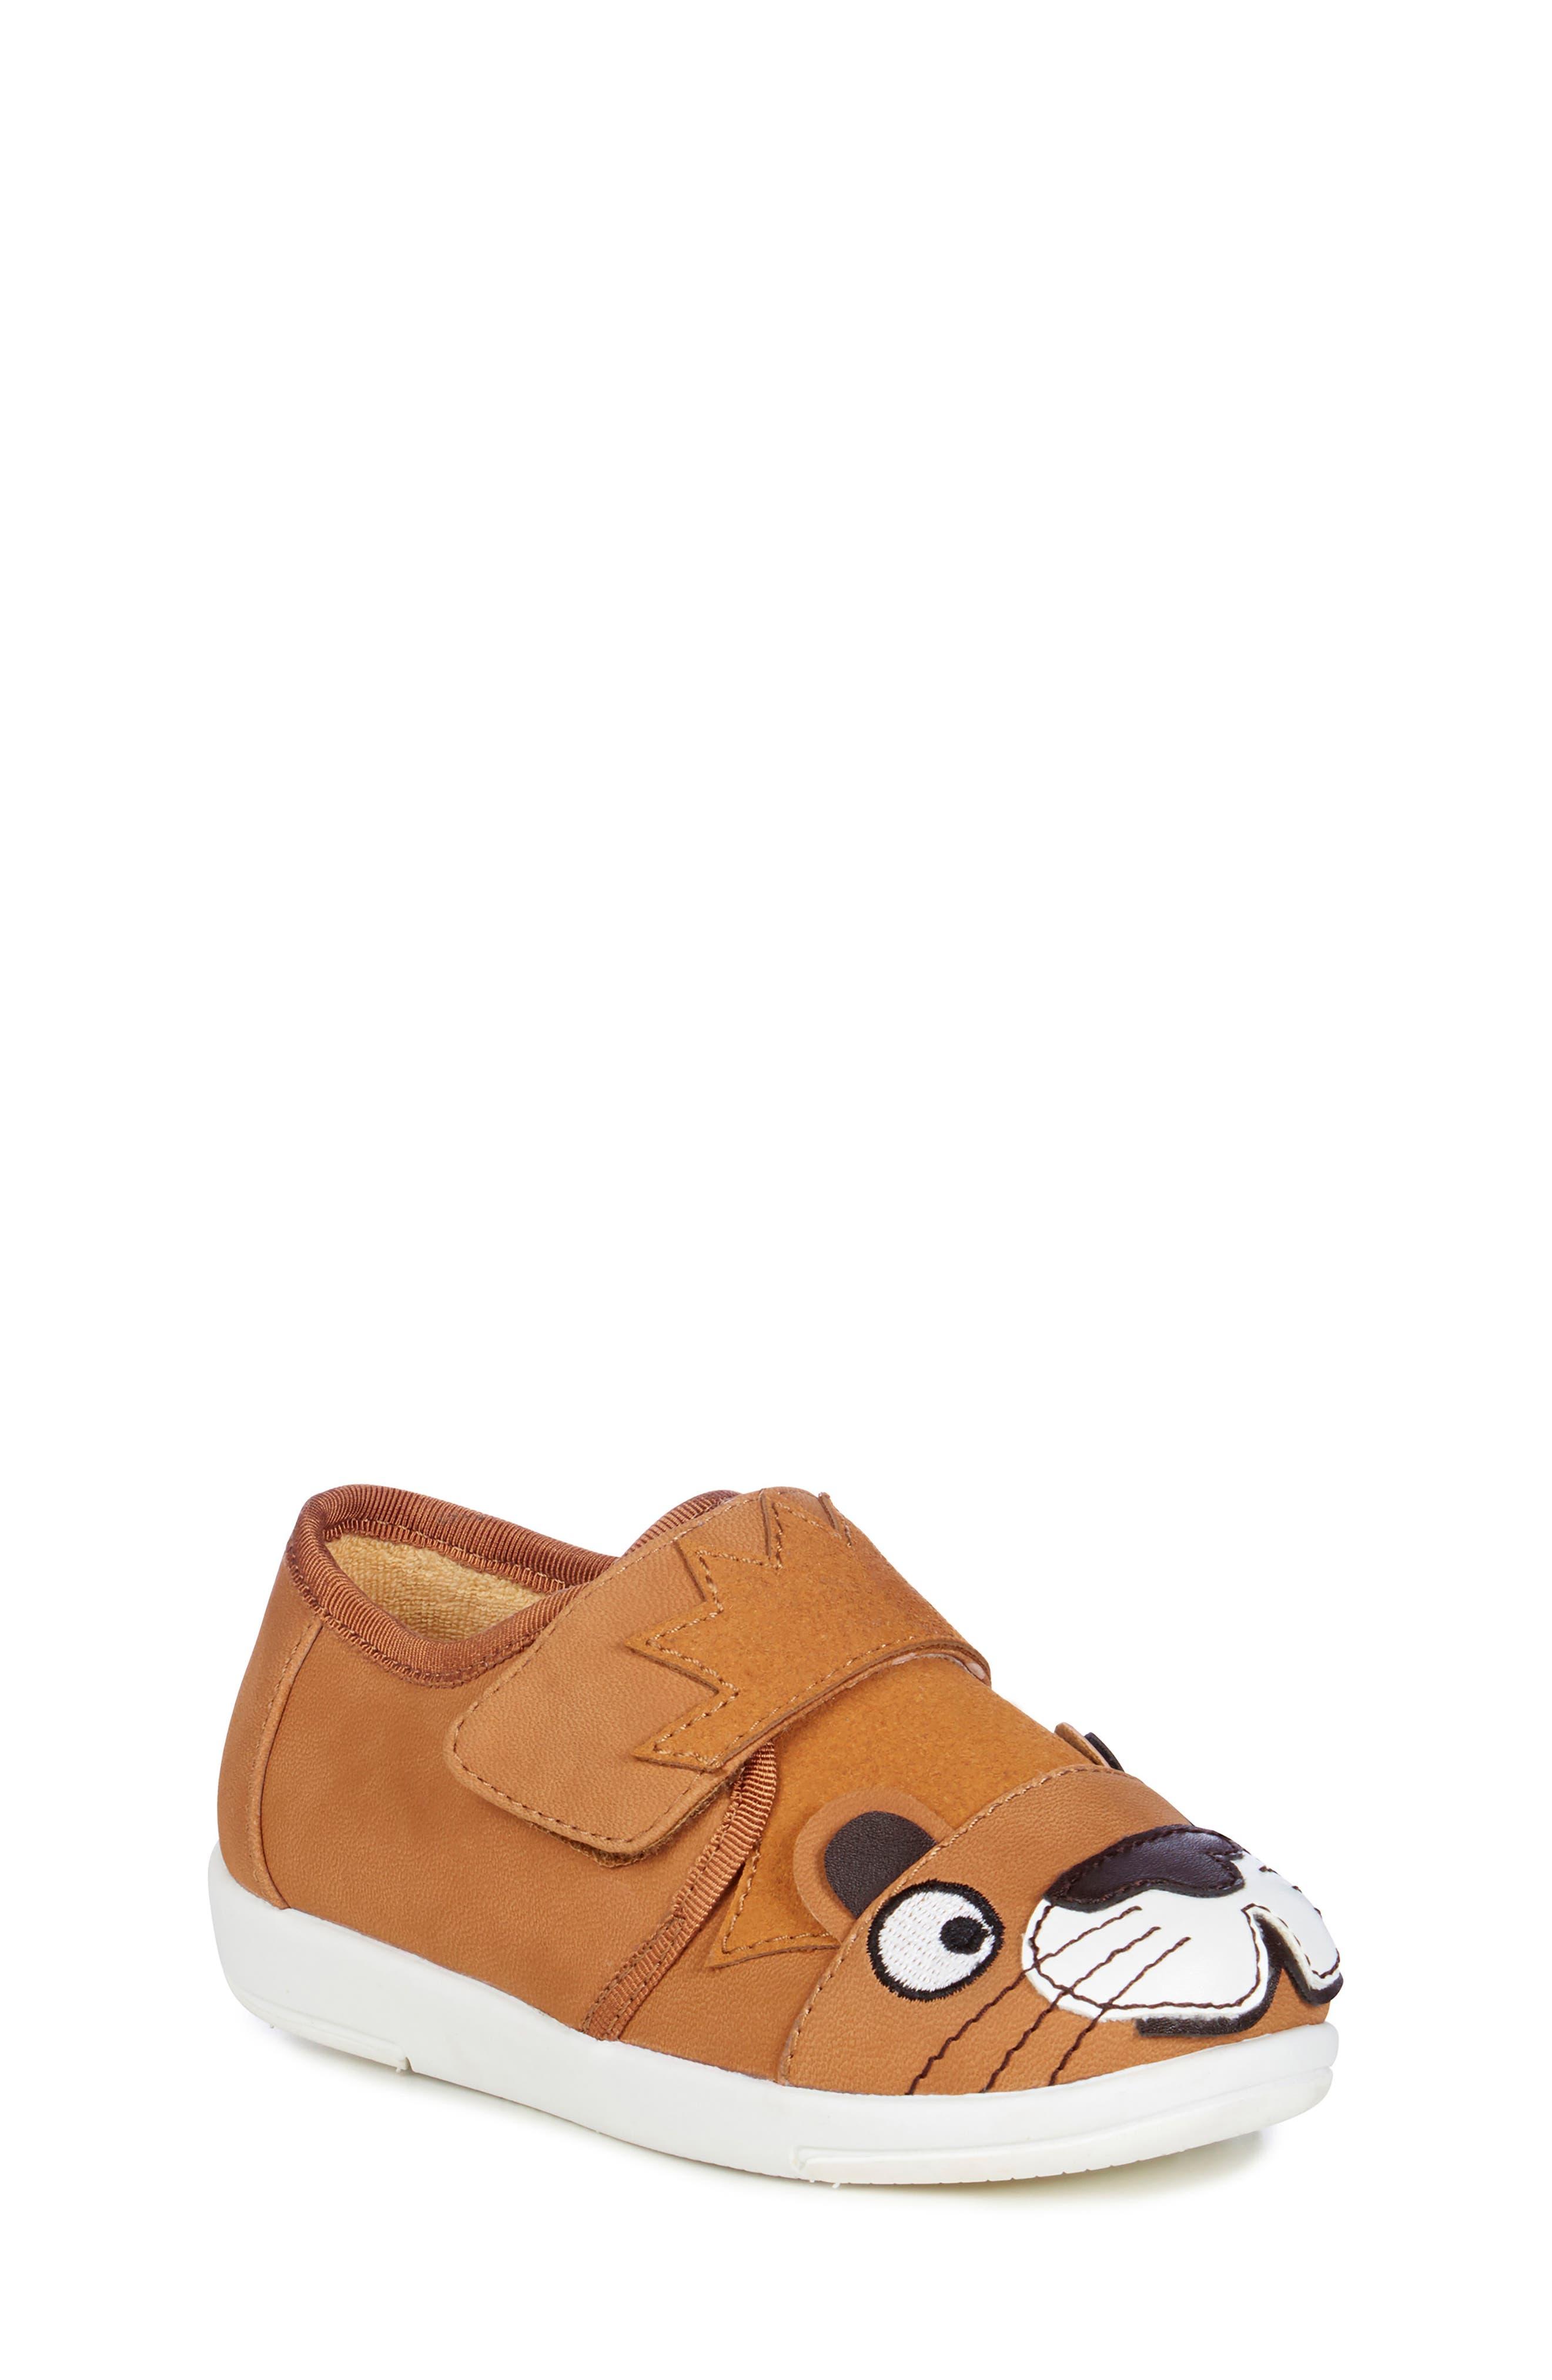 EMU Australia Sneaker (Toddler, Little Kid & Big Kid)